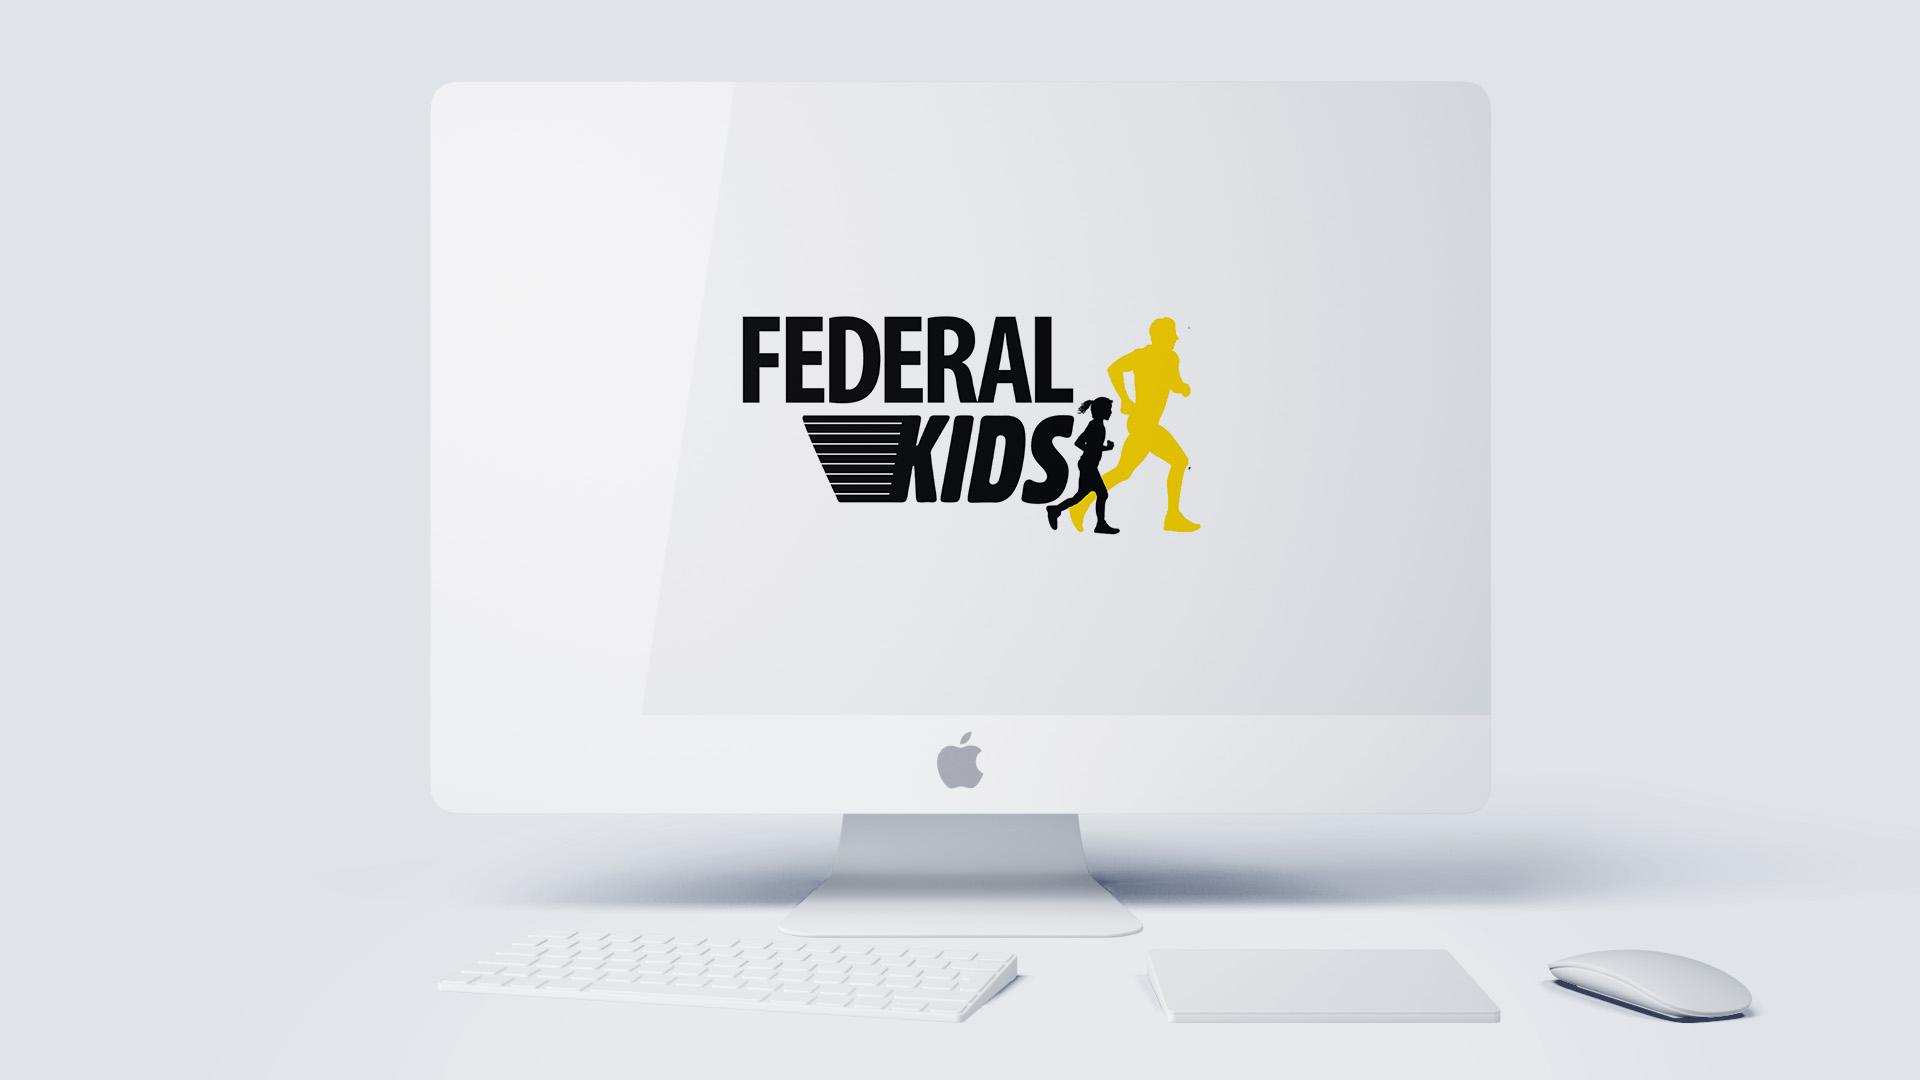 Federal Kids